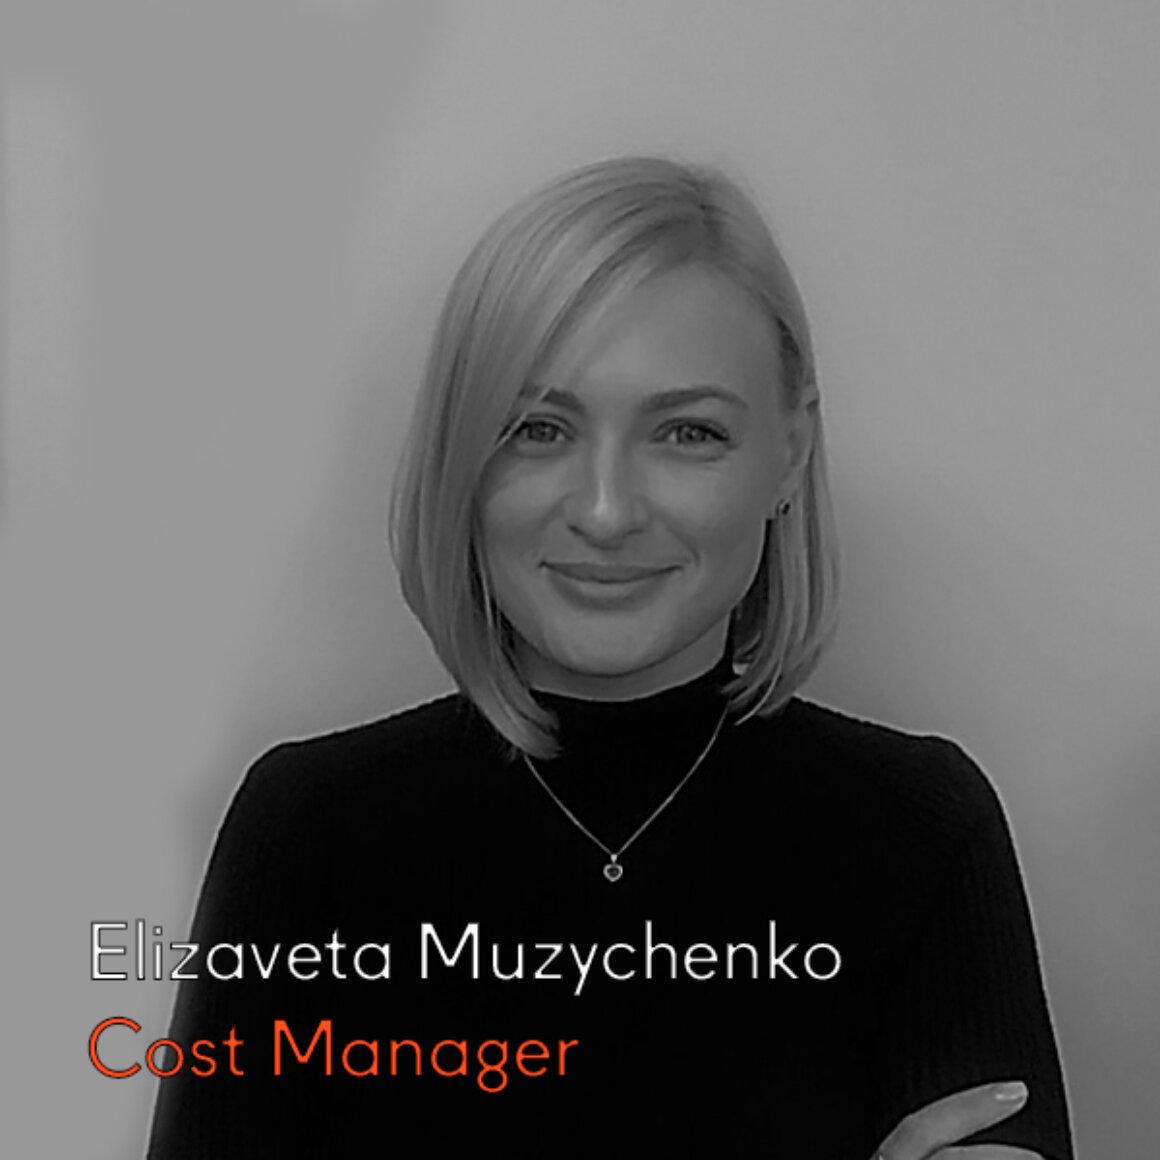 E.Muzychenko